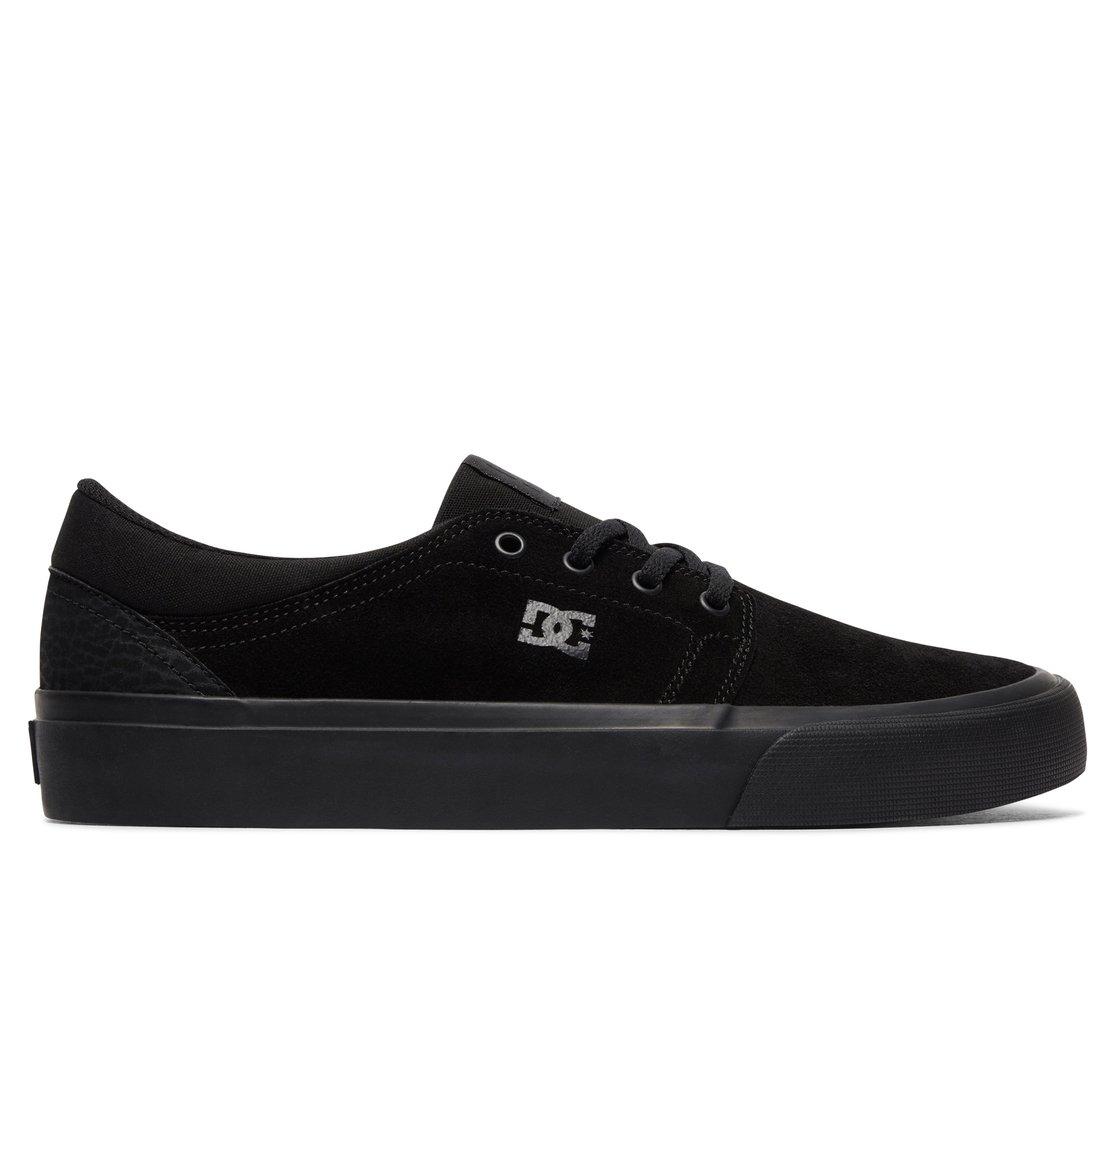 DC Trase S Chaussure - black black white